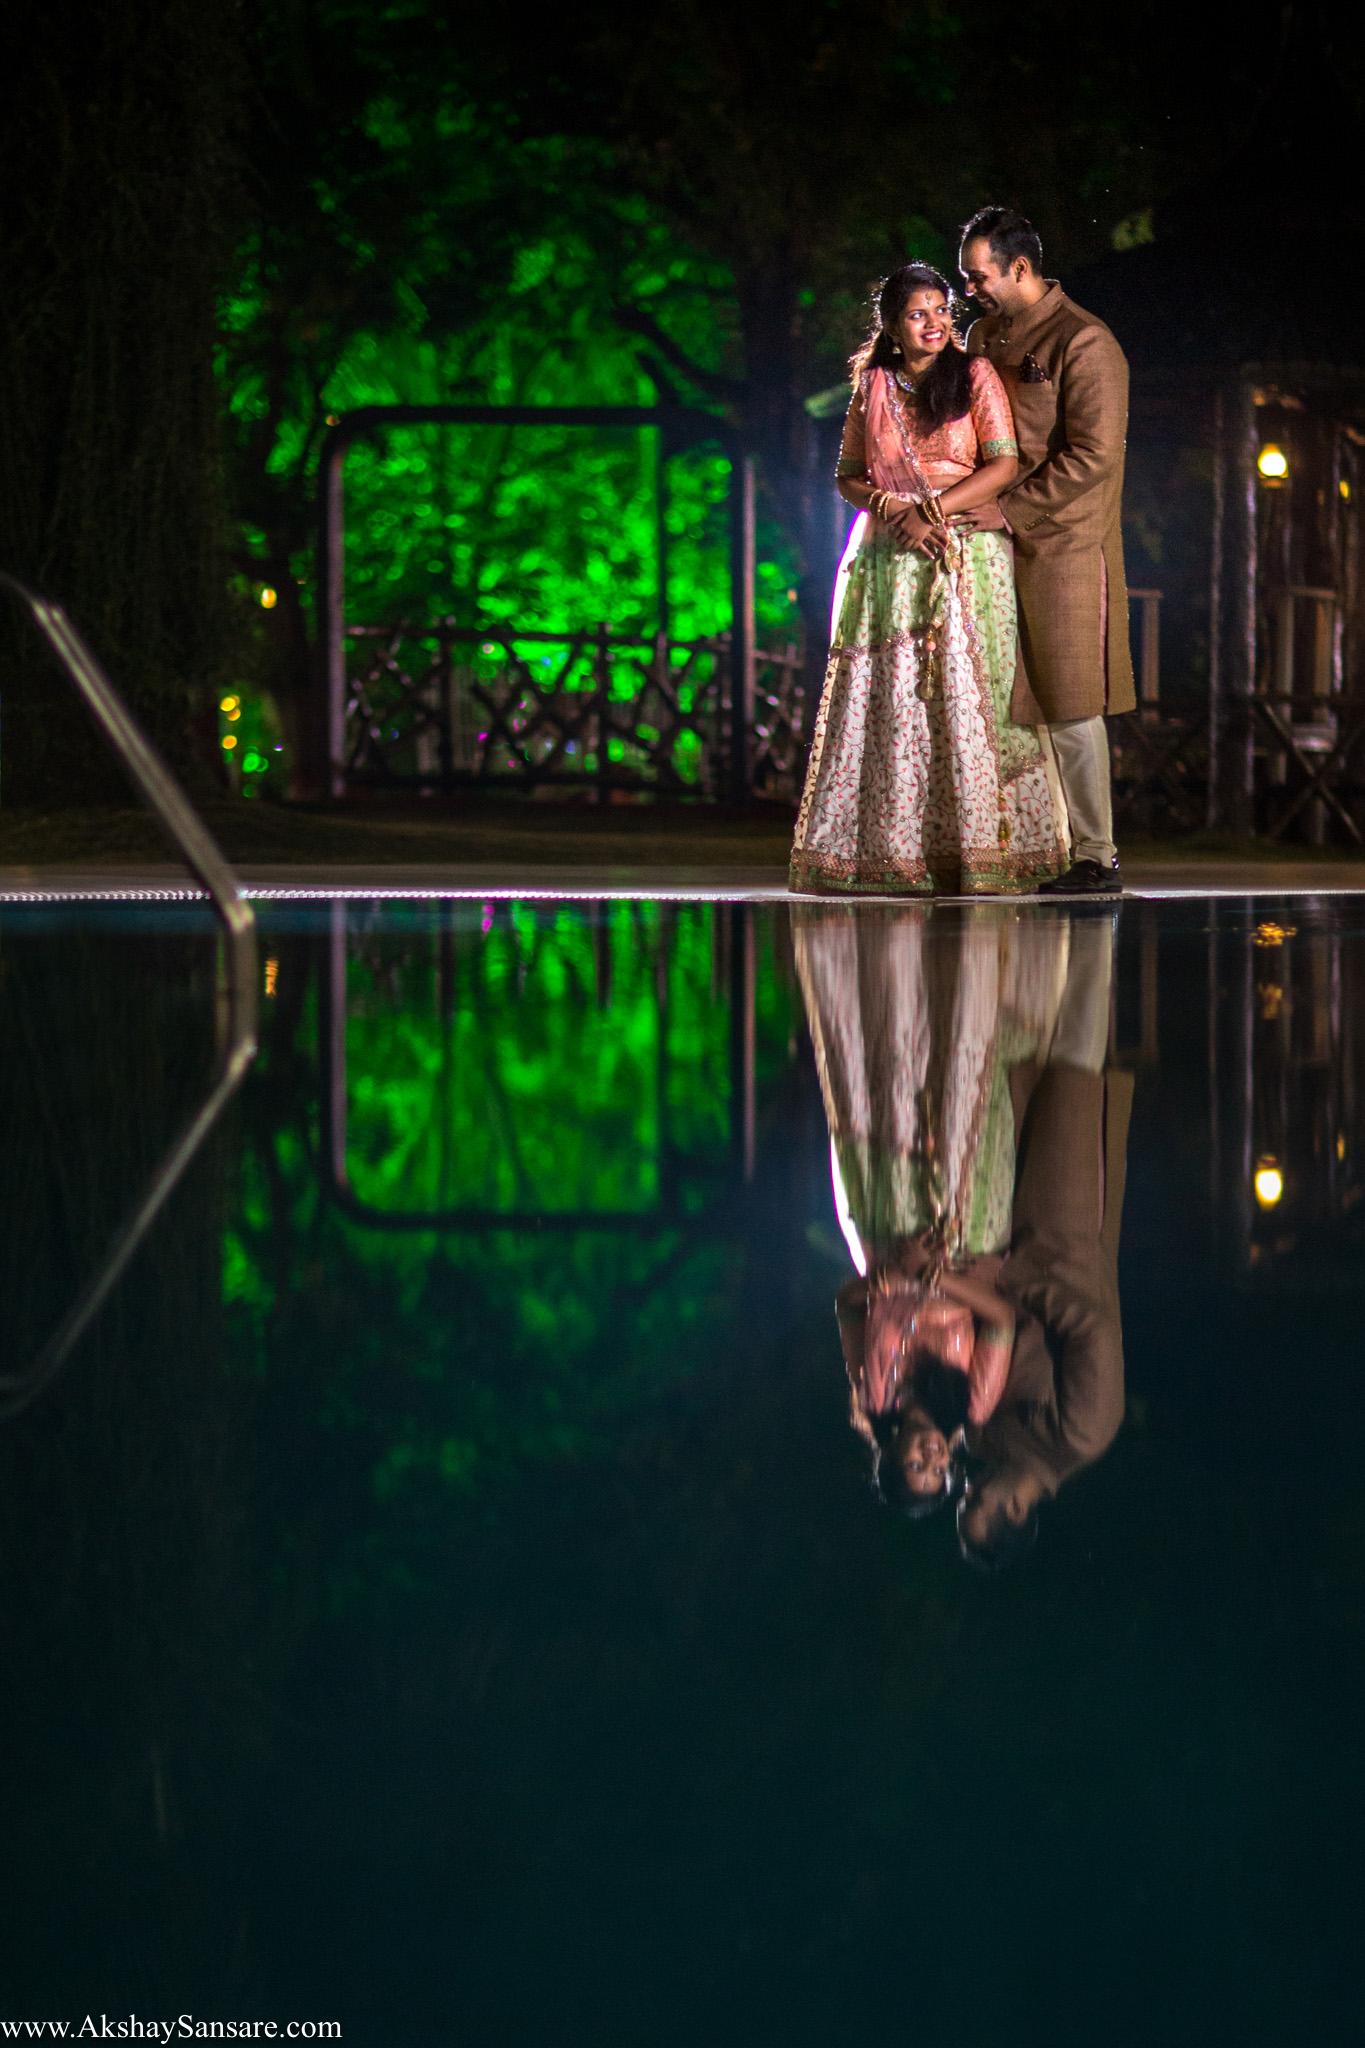 Salil x Kimaya Akshay Sansare Photography Candid wedding Photographer in mumbai best(1).jpg